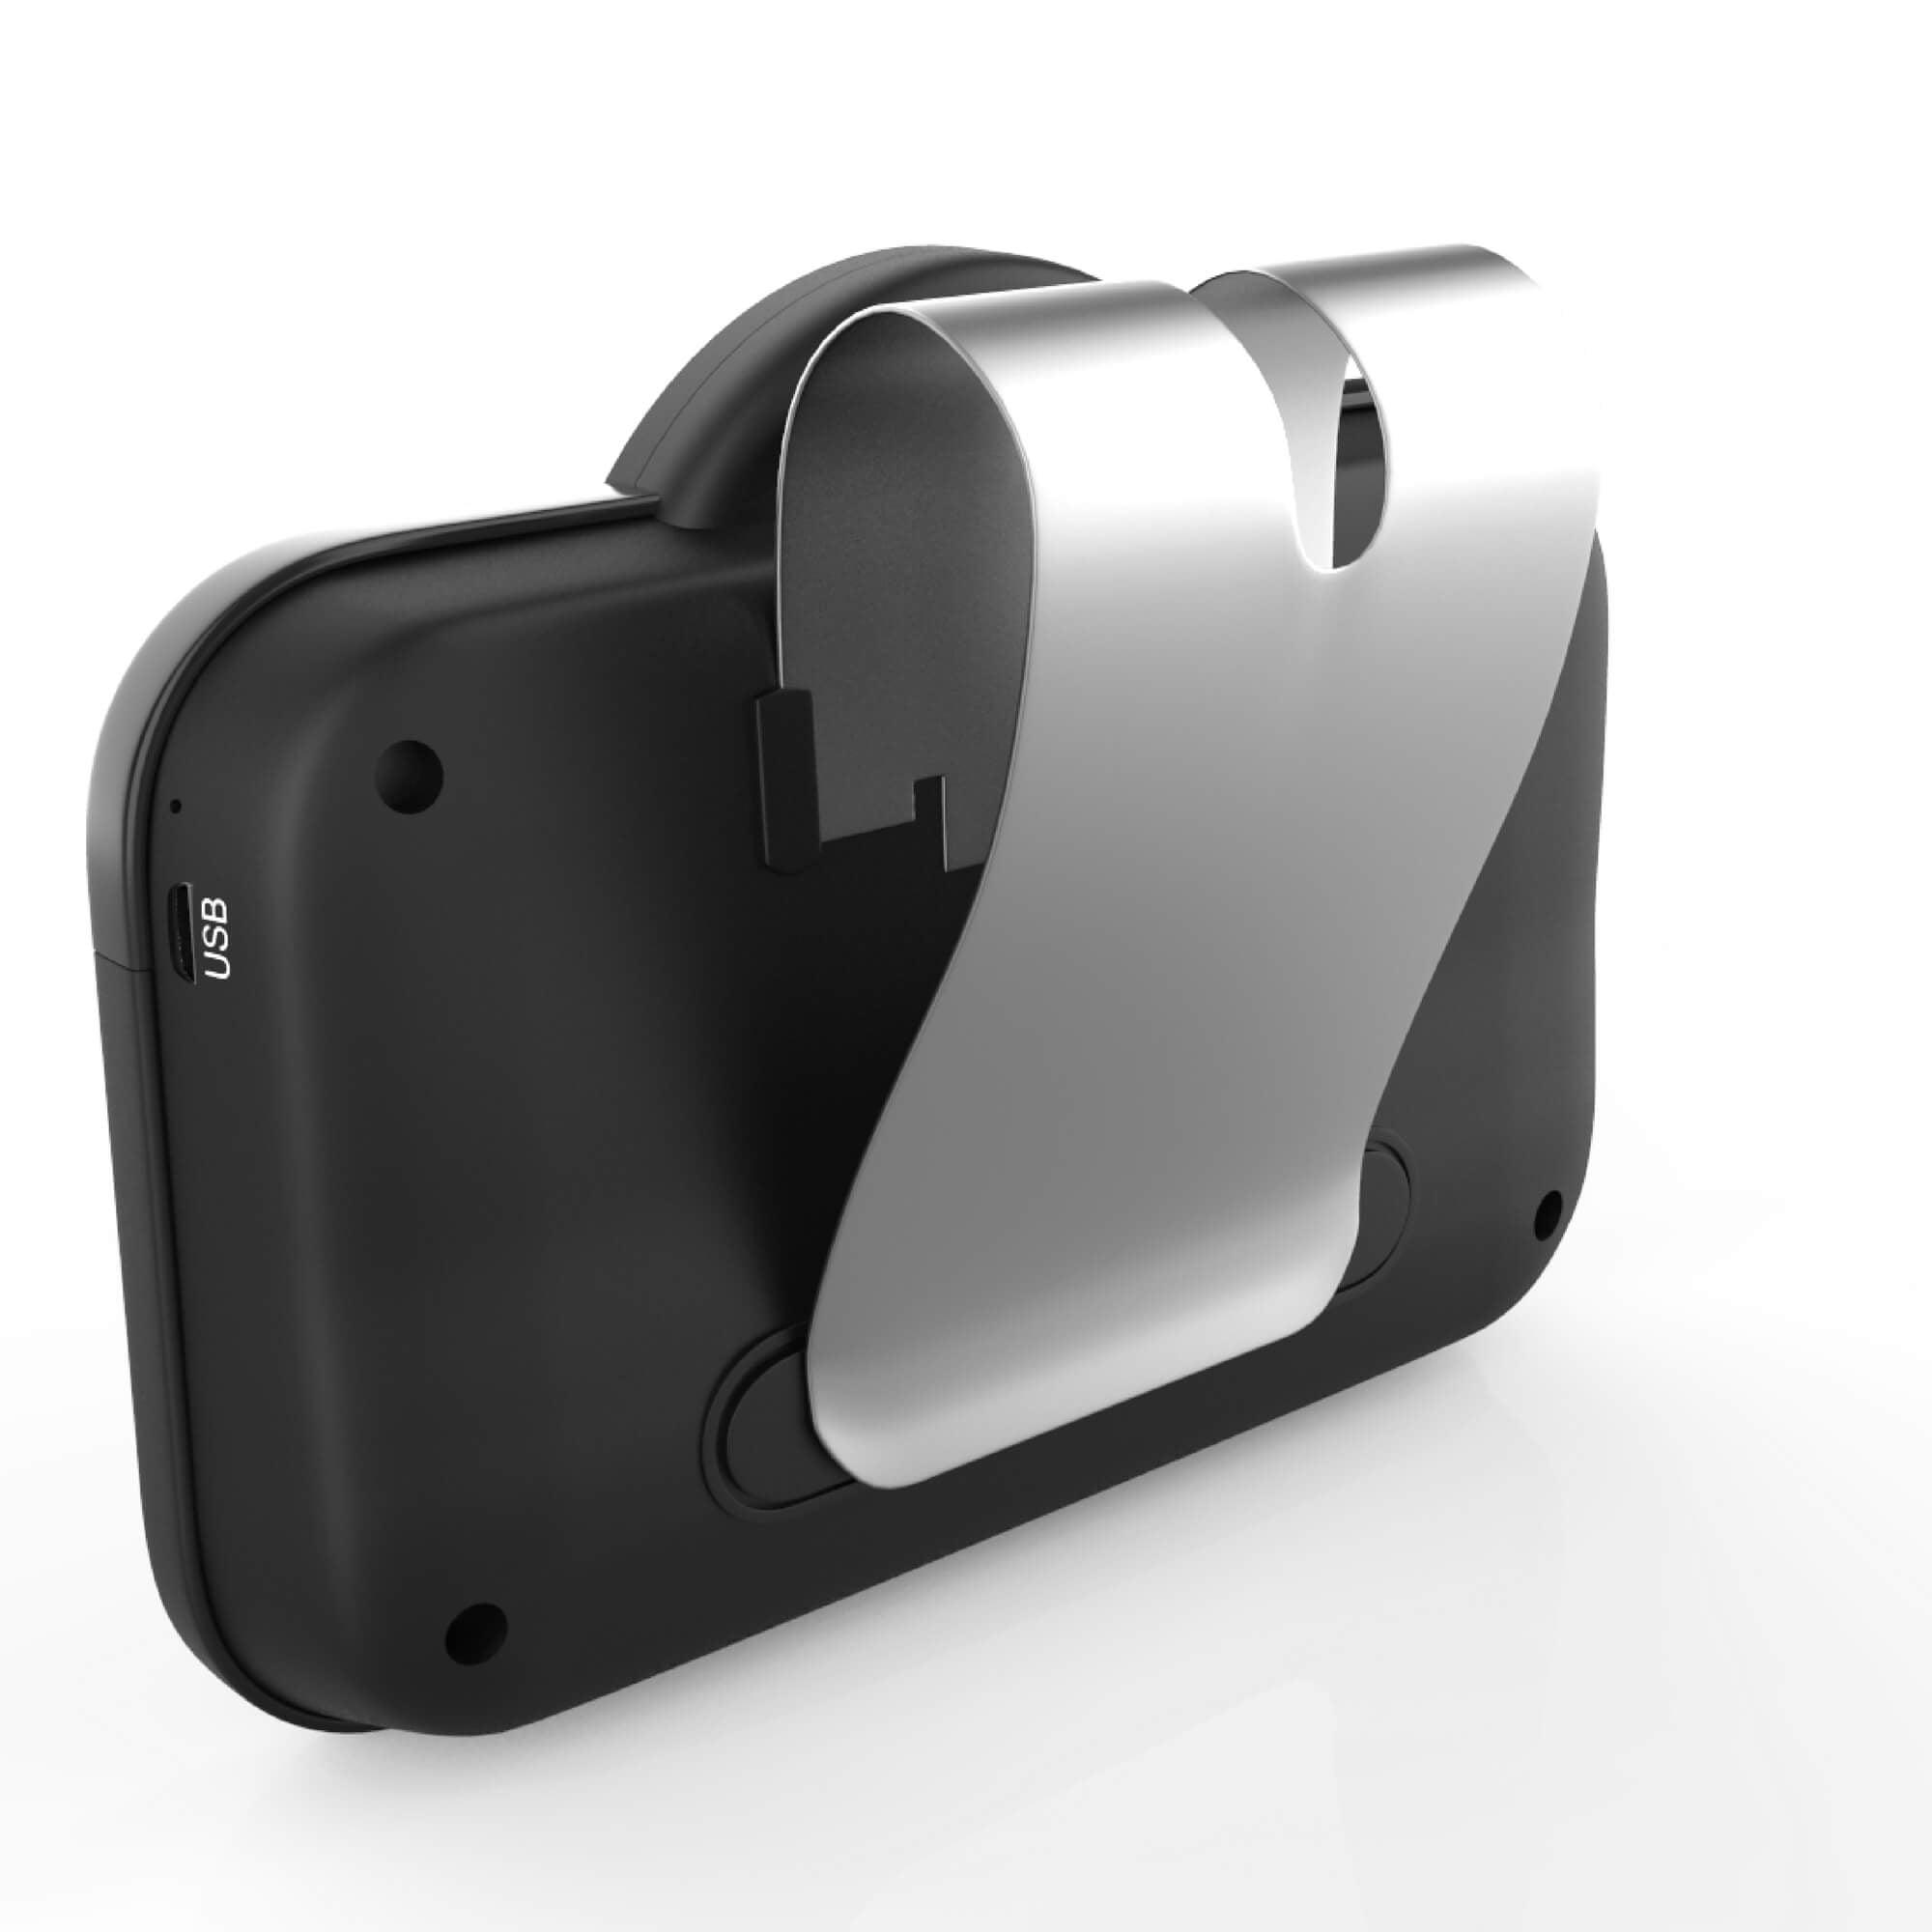 kit main libre b pro 2 veopulse kits mains libres et supports de t l phone. Black Bedroom Furniture Sets. Home Design Ideas